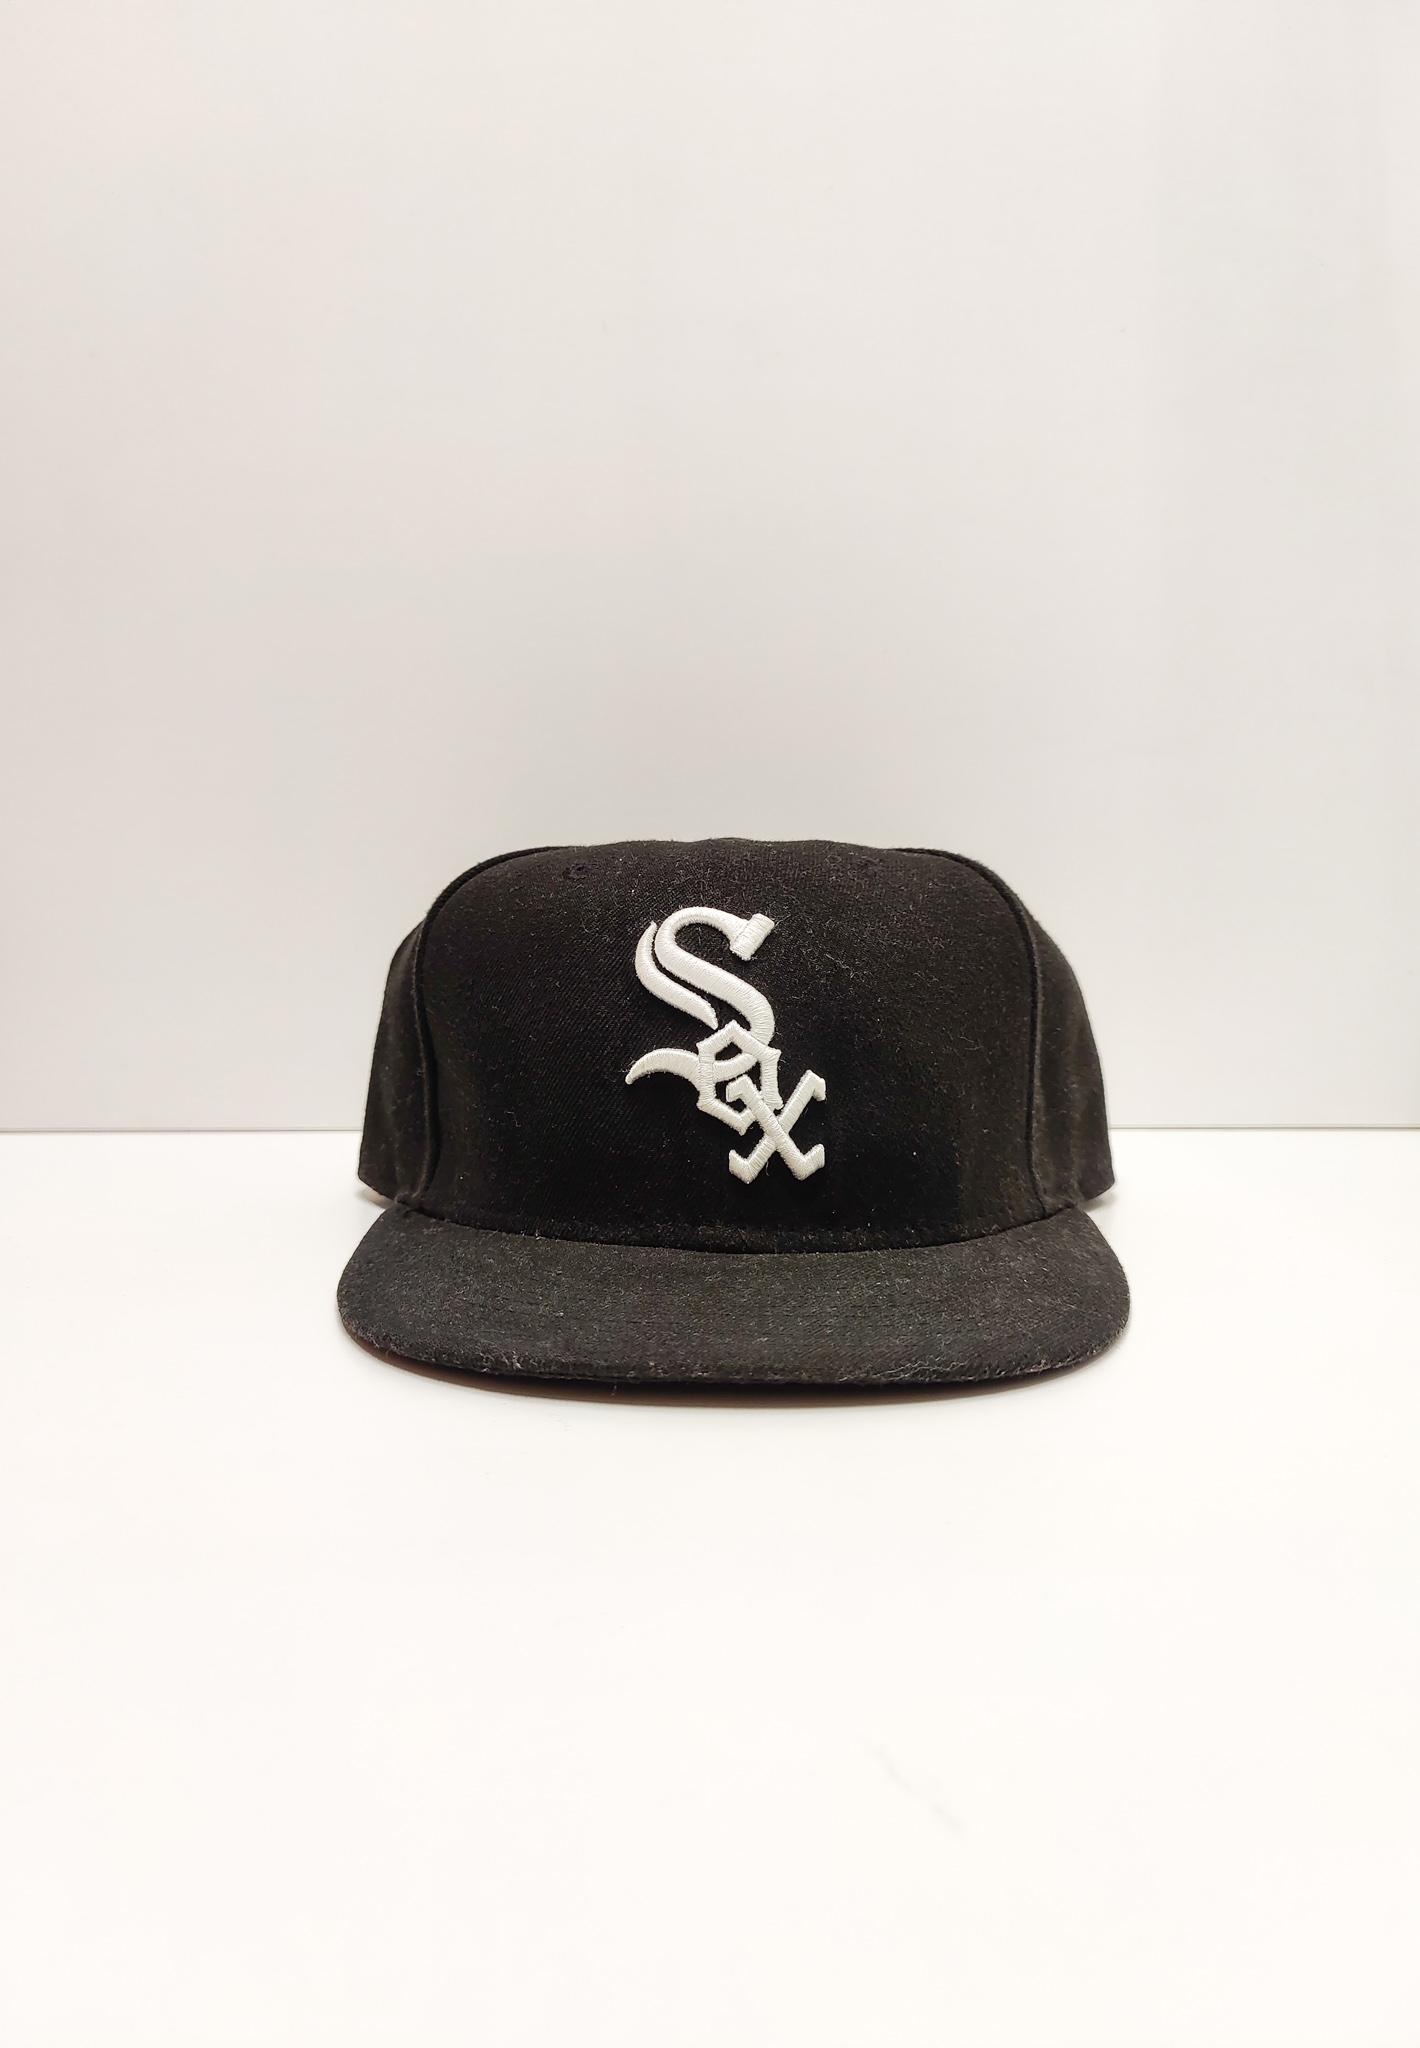 New Era 59Fifty Chicago White Sox